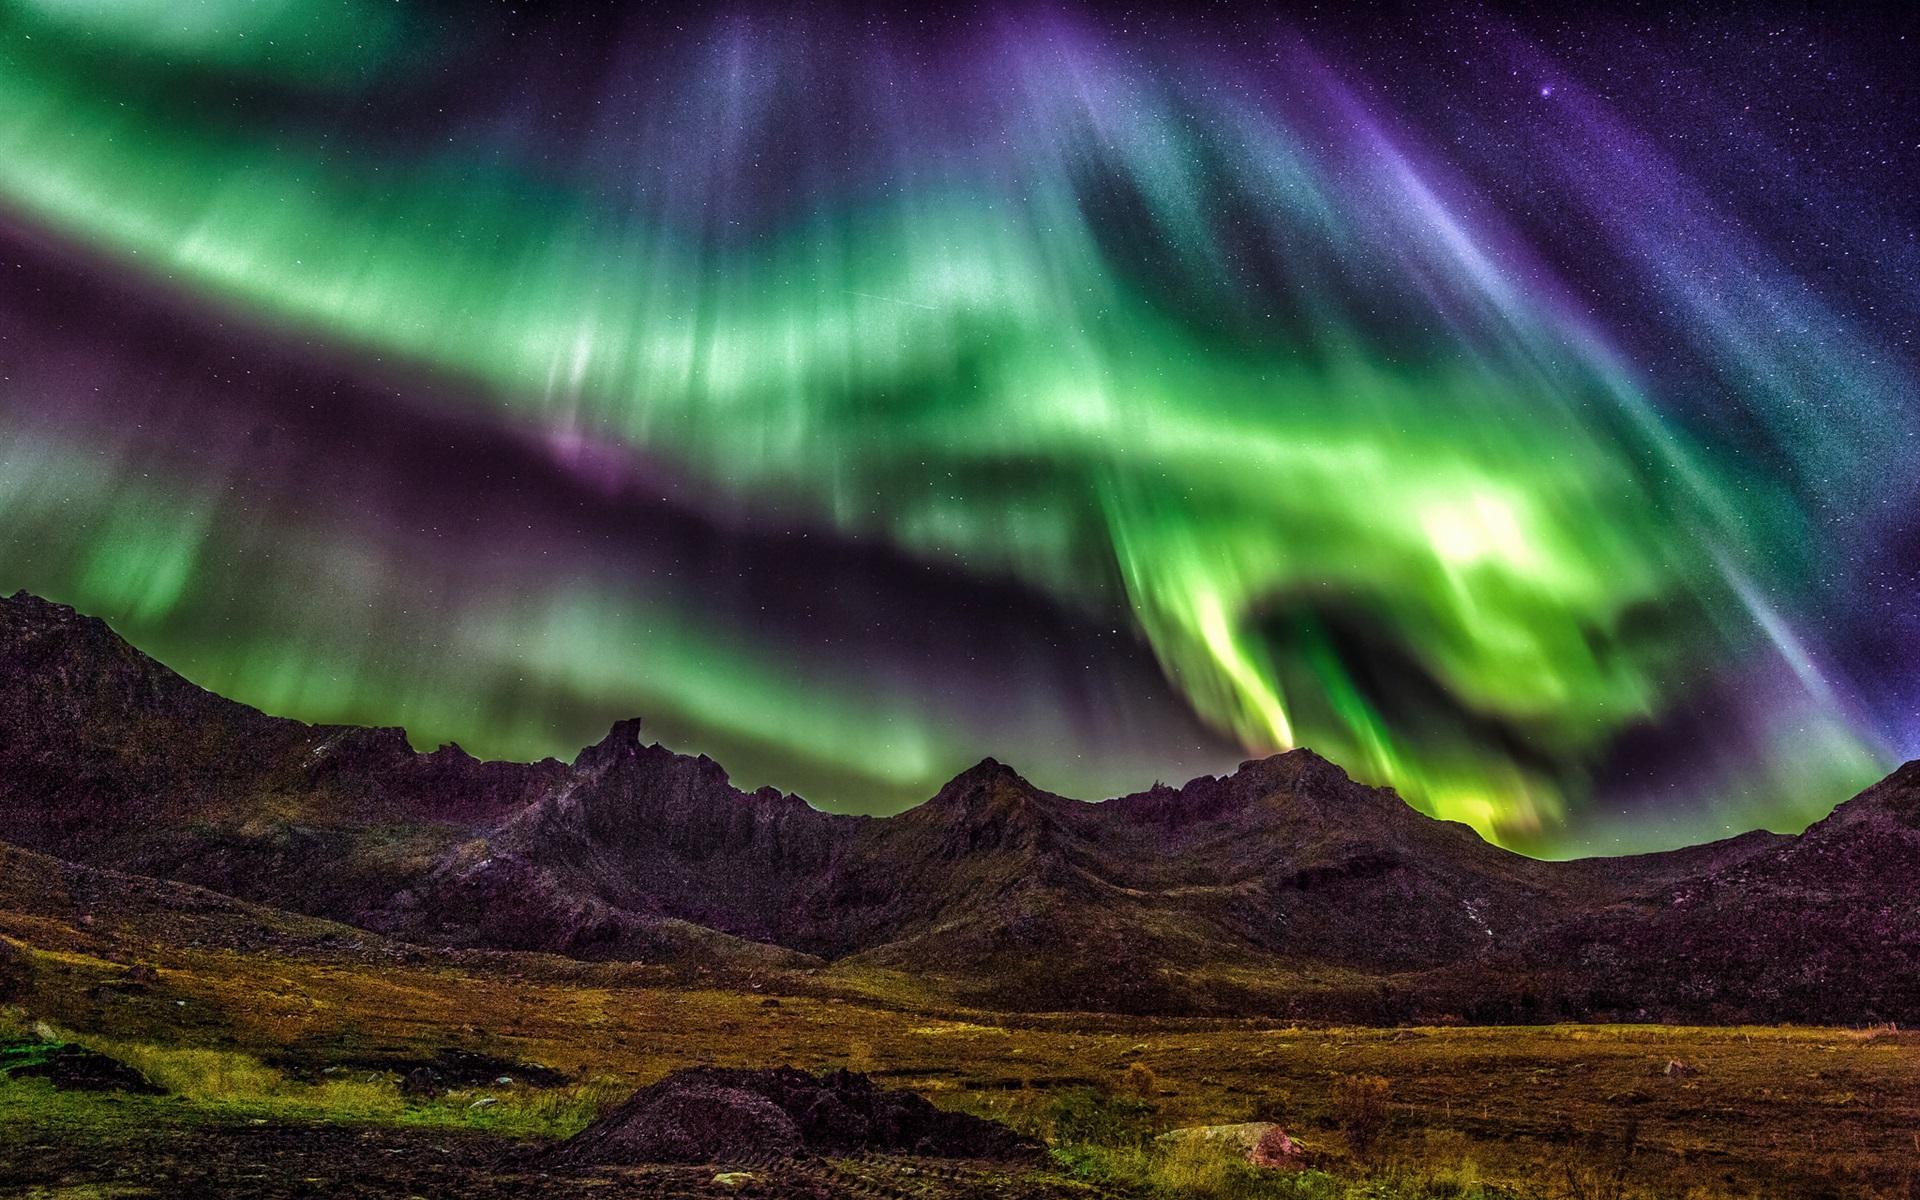 Pc Wallpaper 3d Love Lofoten Islands Norway Beautiful Night Northern Lights